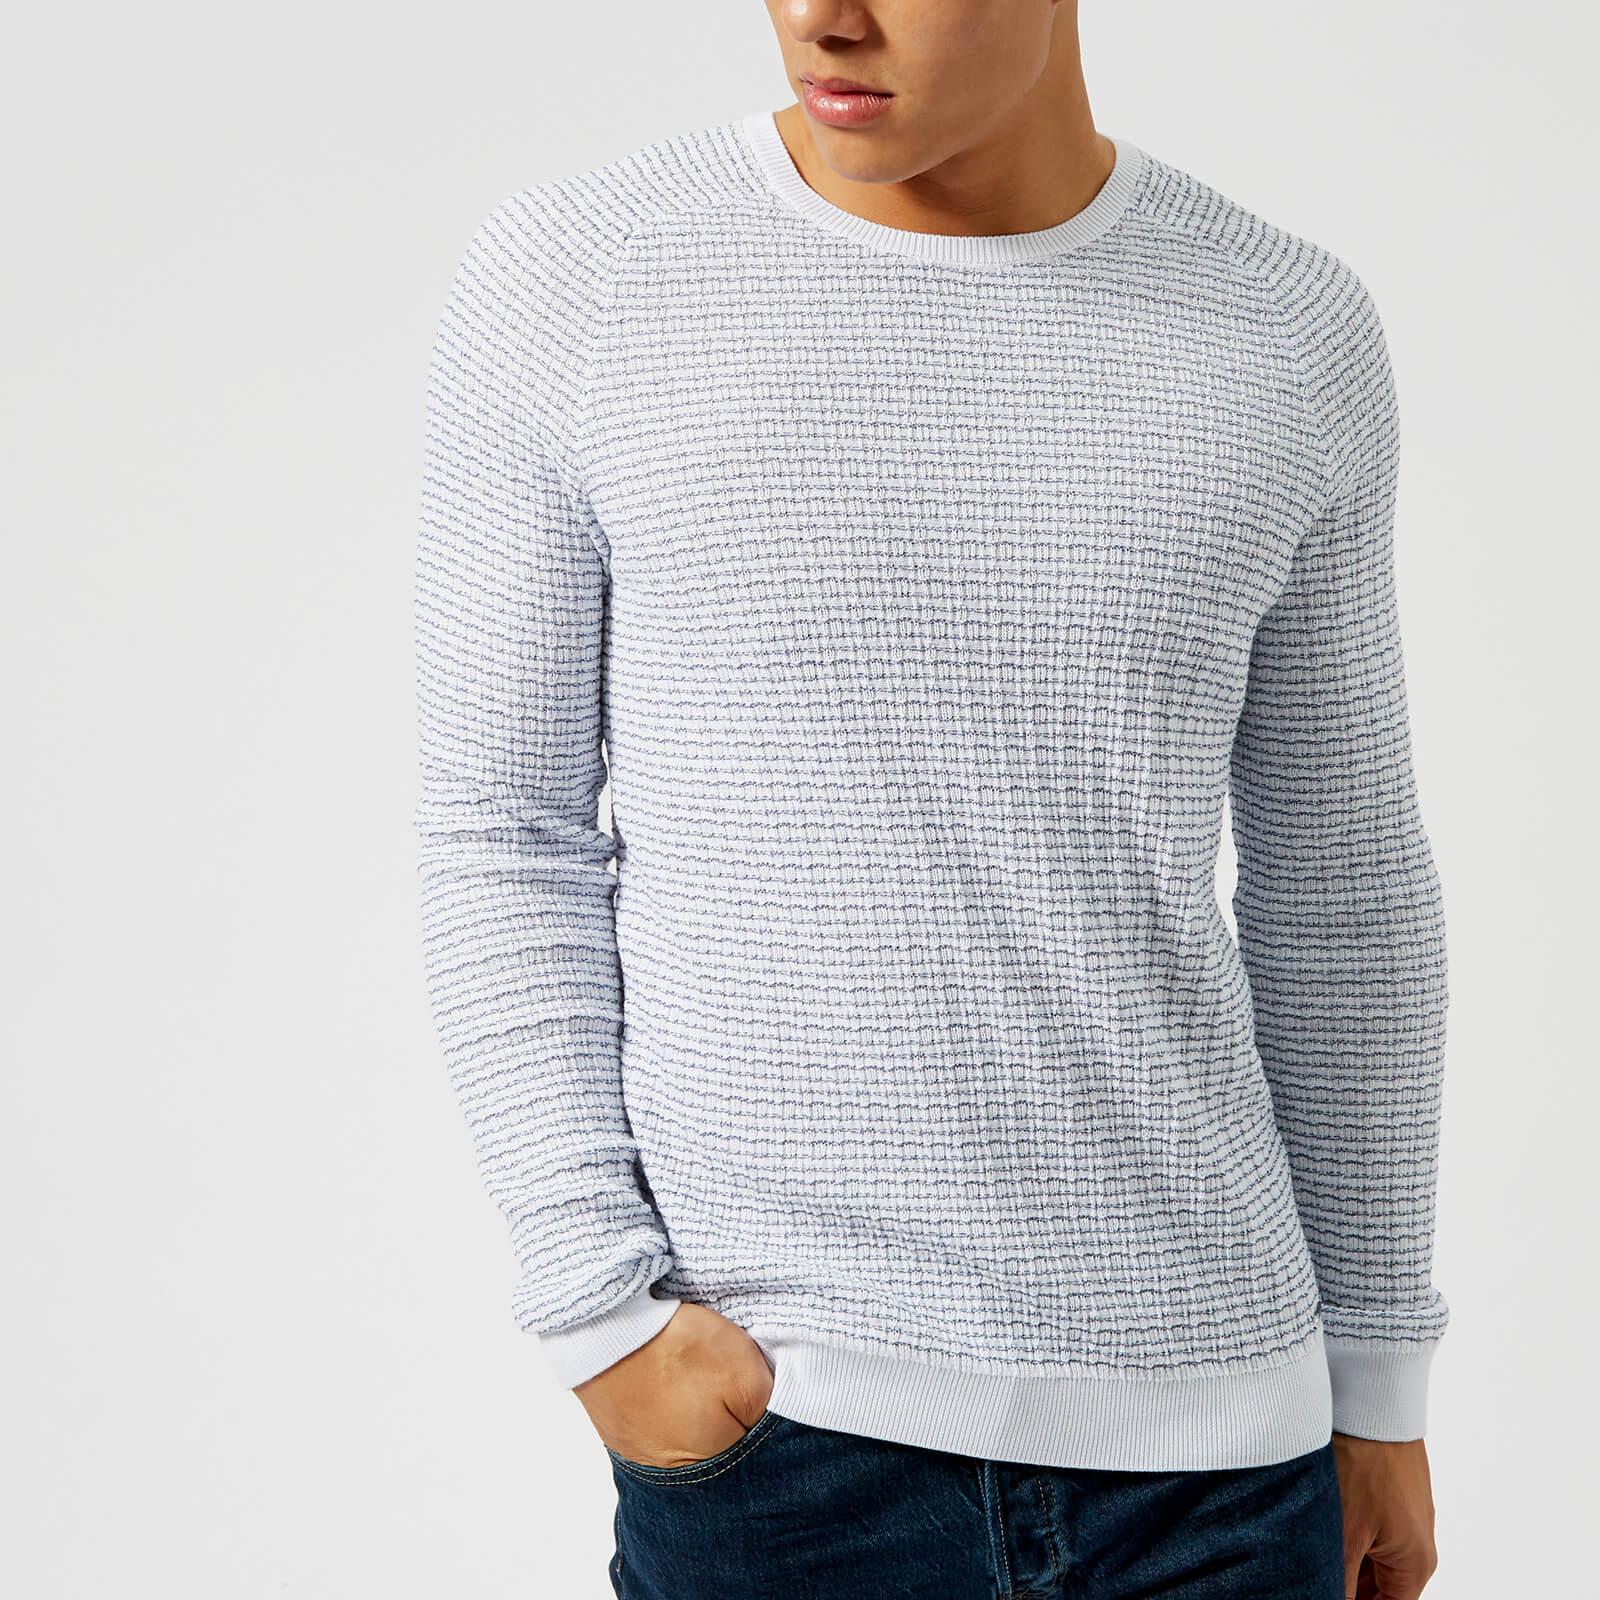 7cadeaa5792787 HUGO Men's Stanon Knit Jumper - White Mens Clothing | TheHut.com